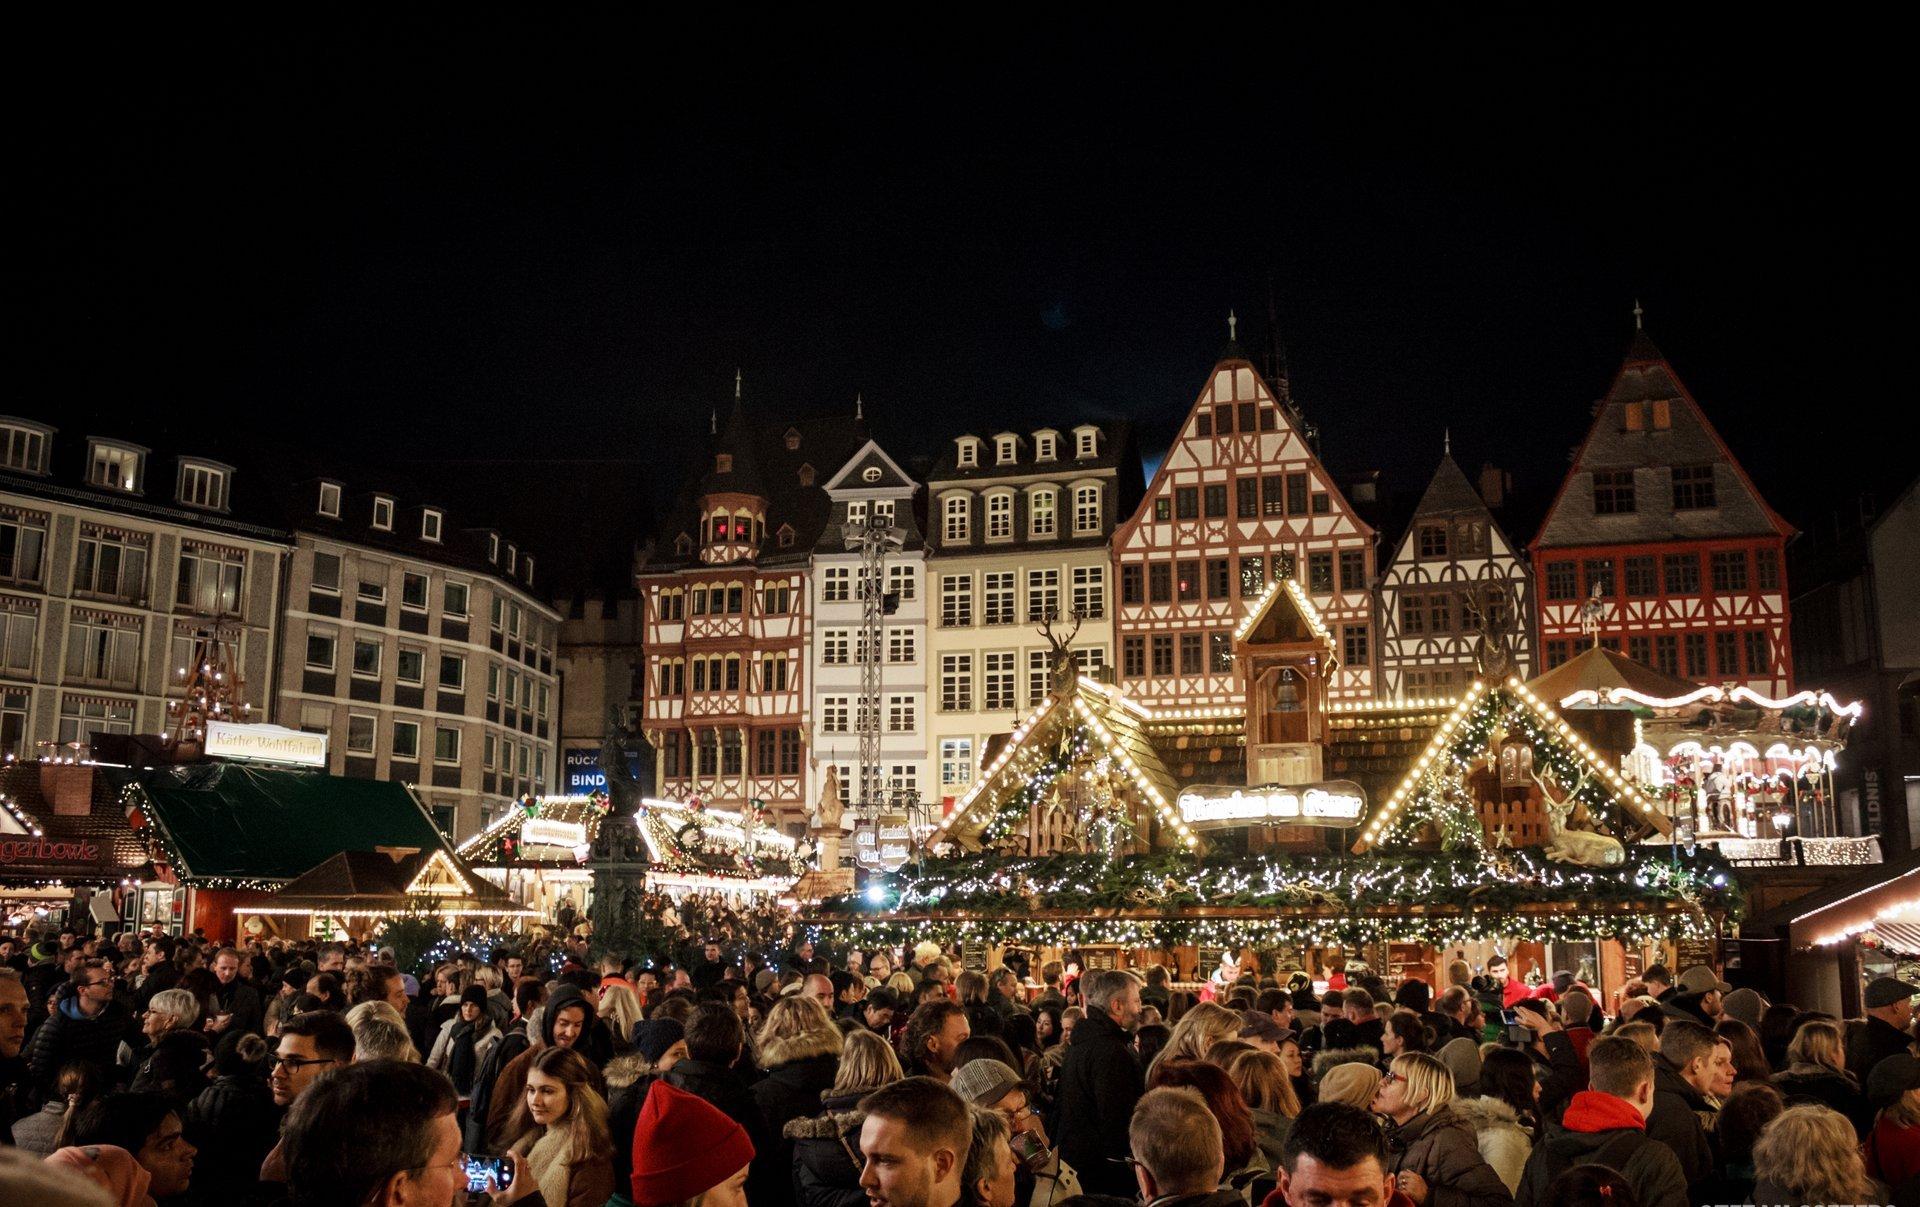 Frankfurt Christmas Market at Römerberg 2020